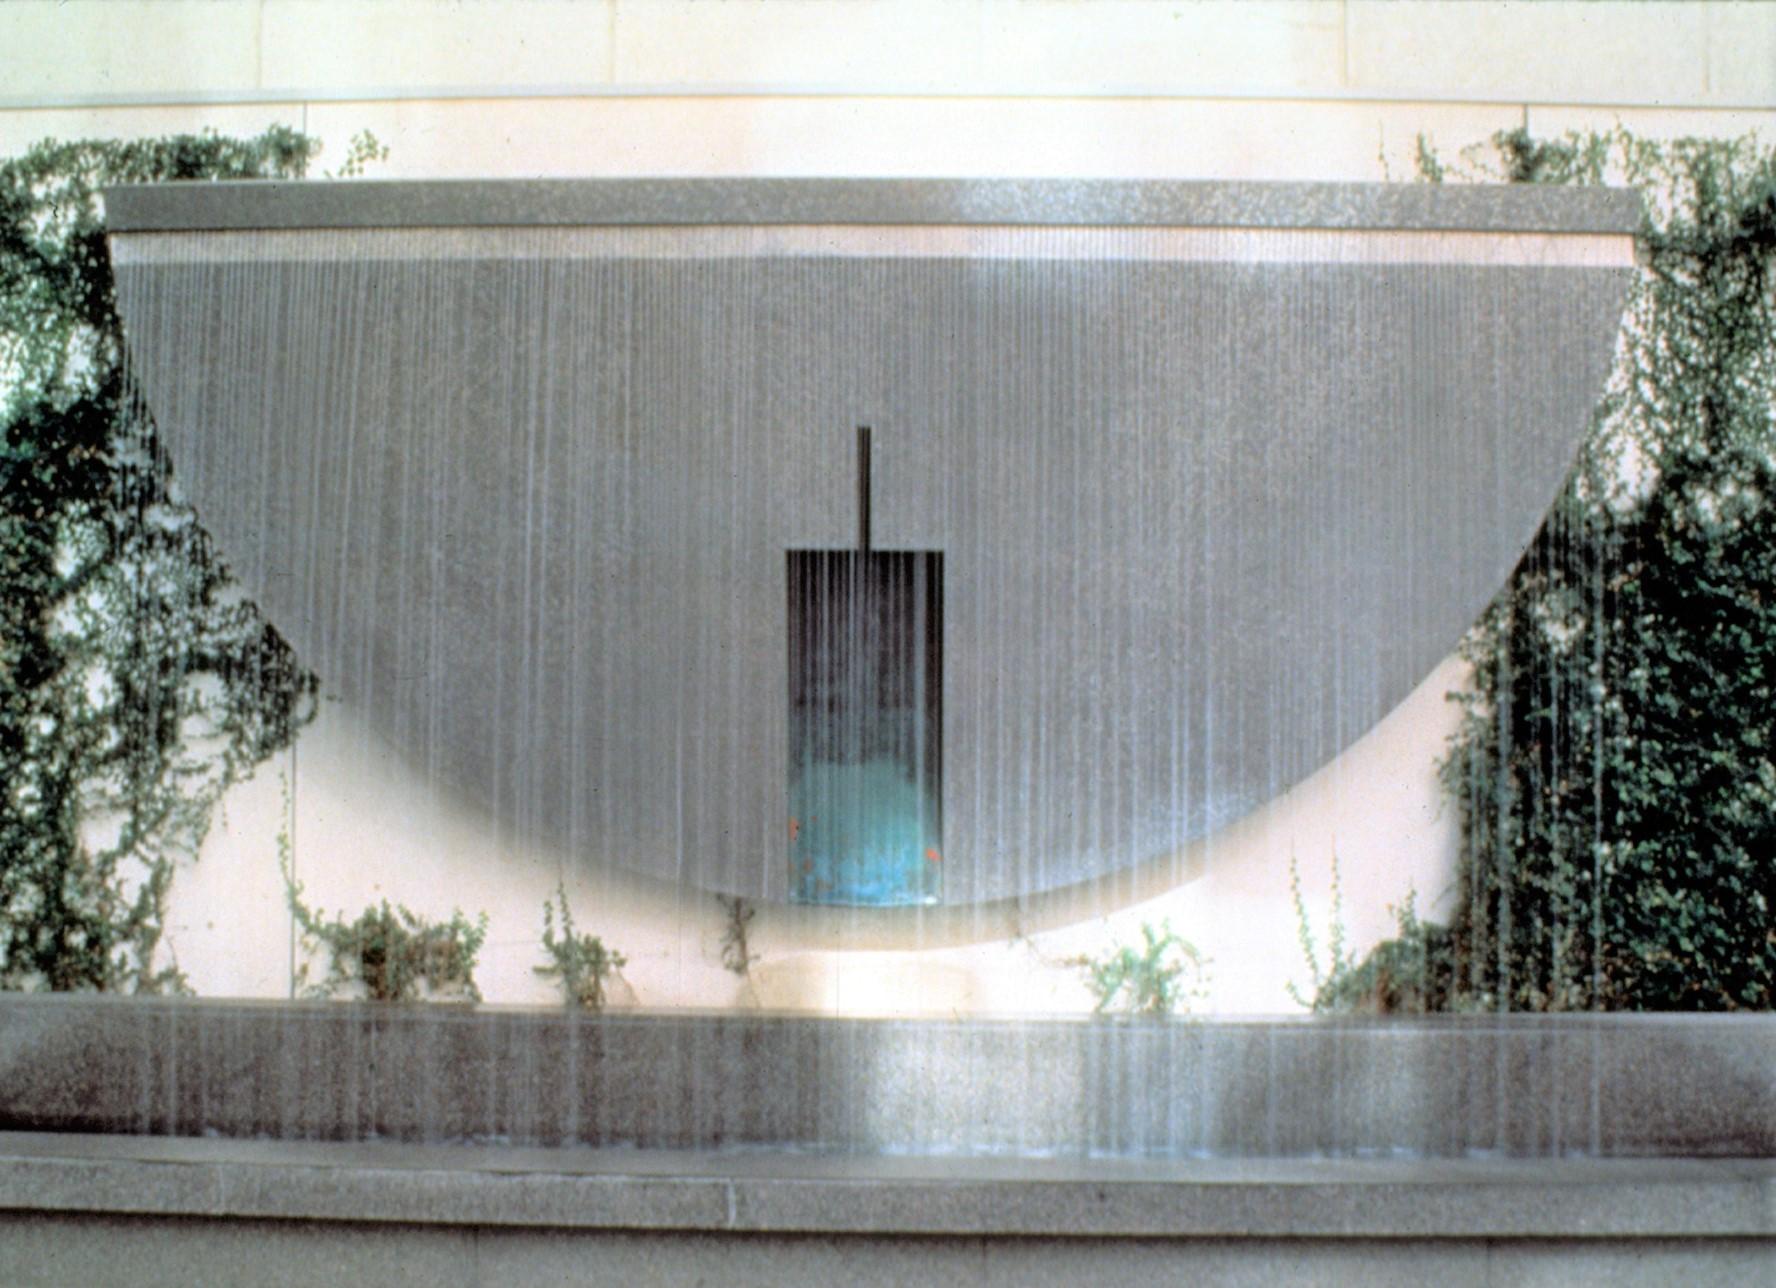 Lita Albuquerque  Site/Memory/Reflection – Fountain 1994  Stainless steel and copper  18 feet dia.      View More Lita Albuquerque